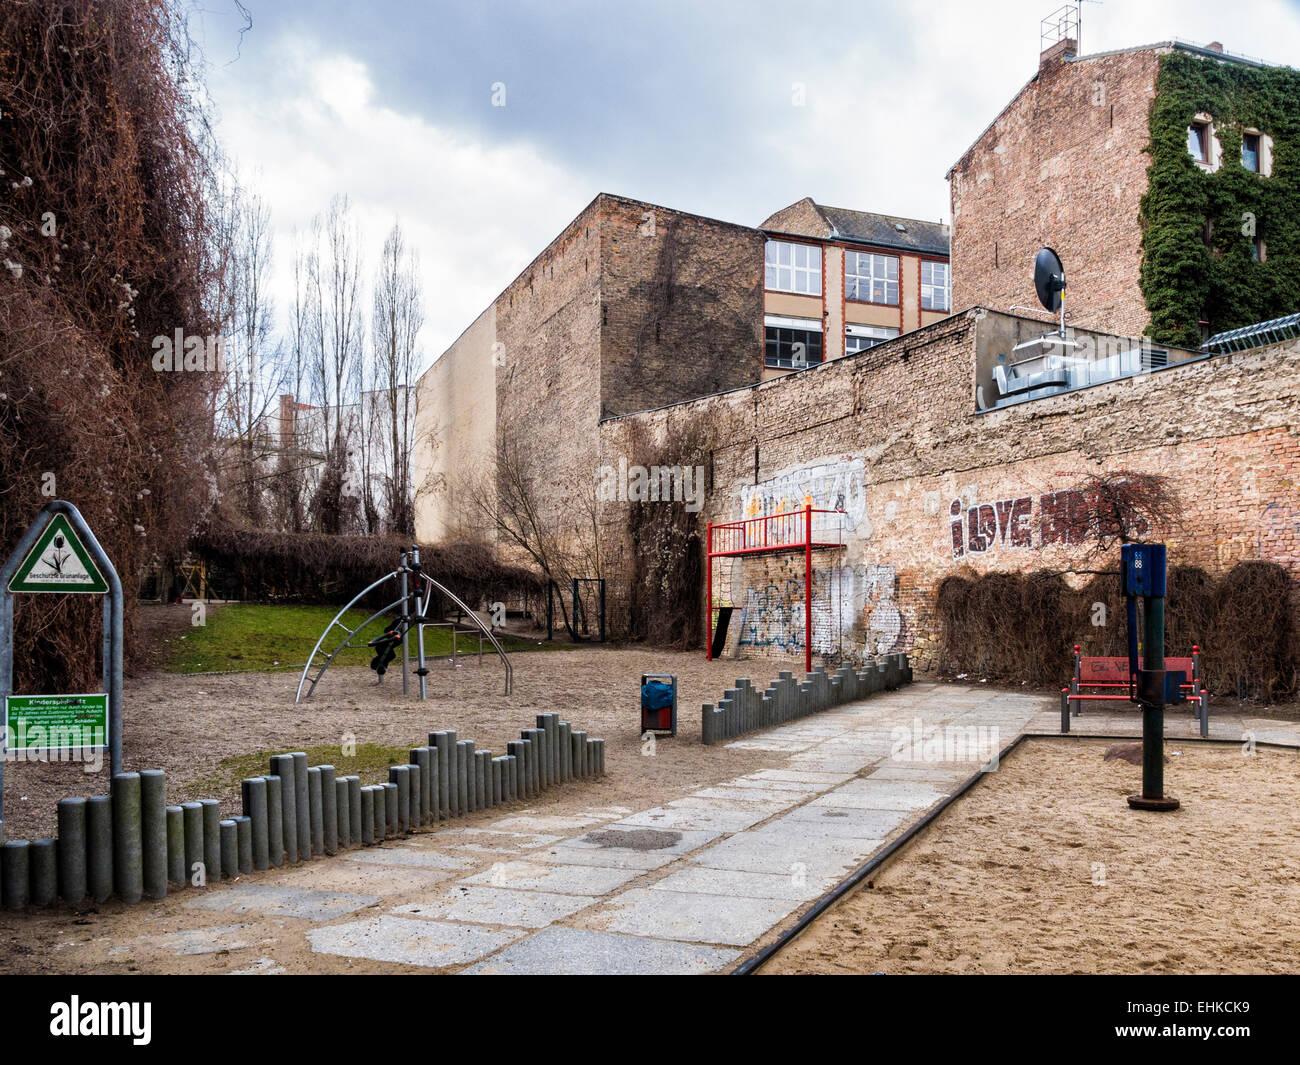 Berlin children's playground surrounded by brick buildings, Kreuzberg, Berlin - Stock Image